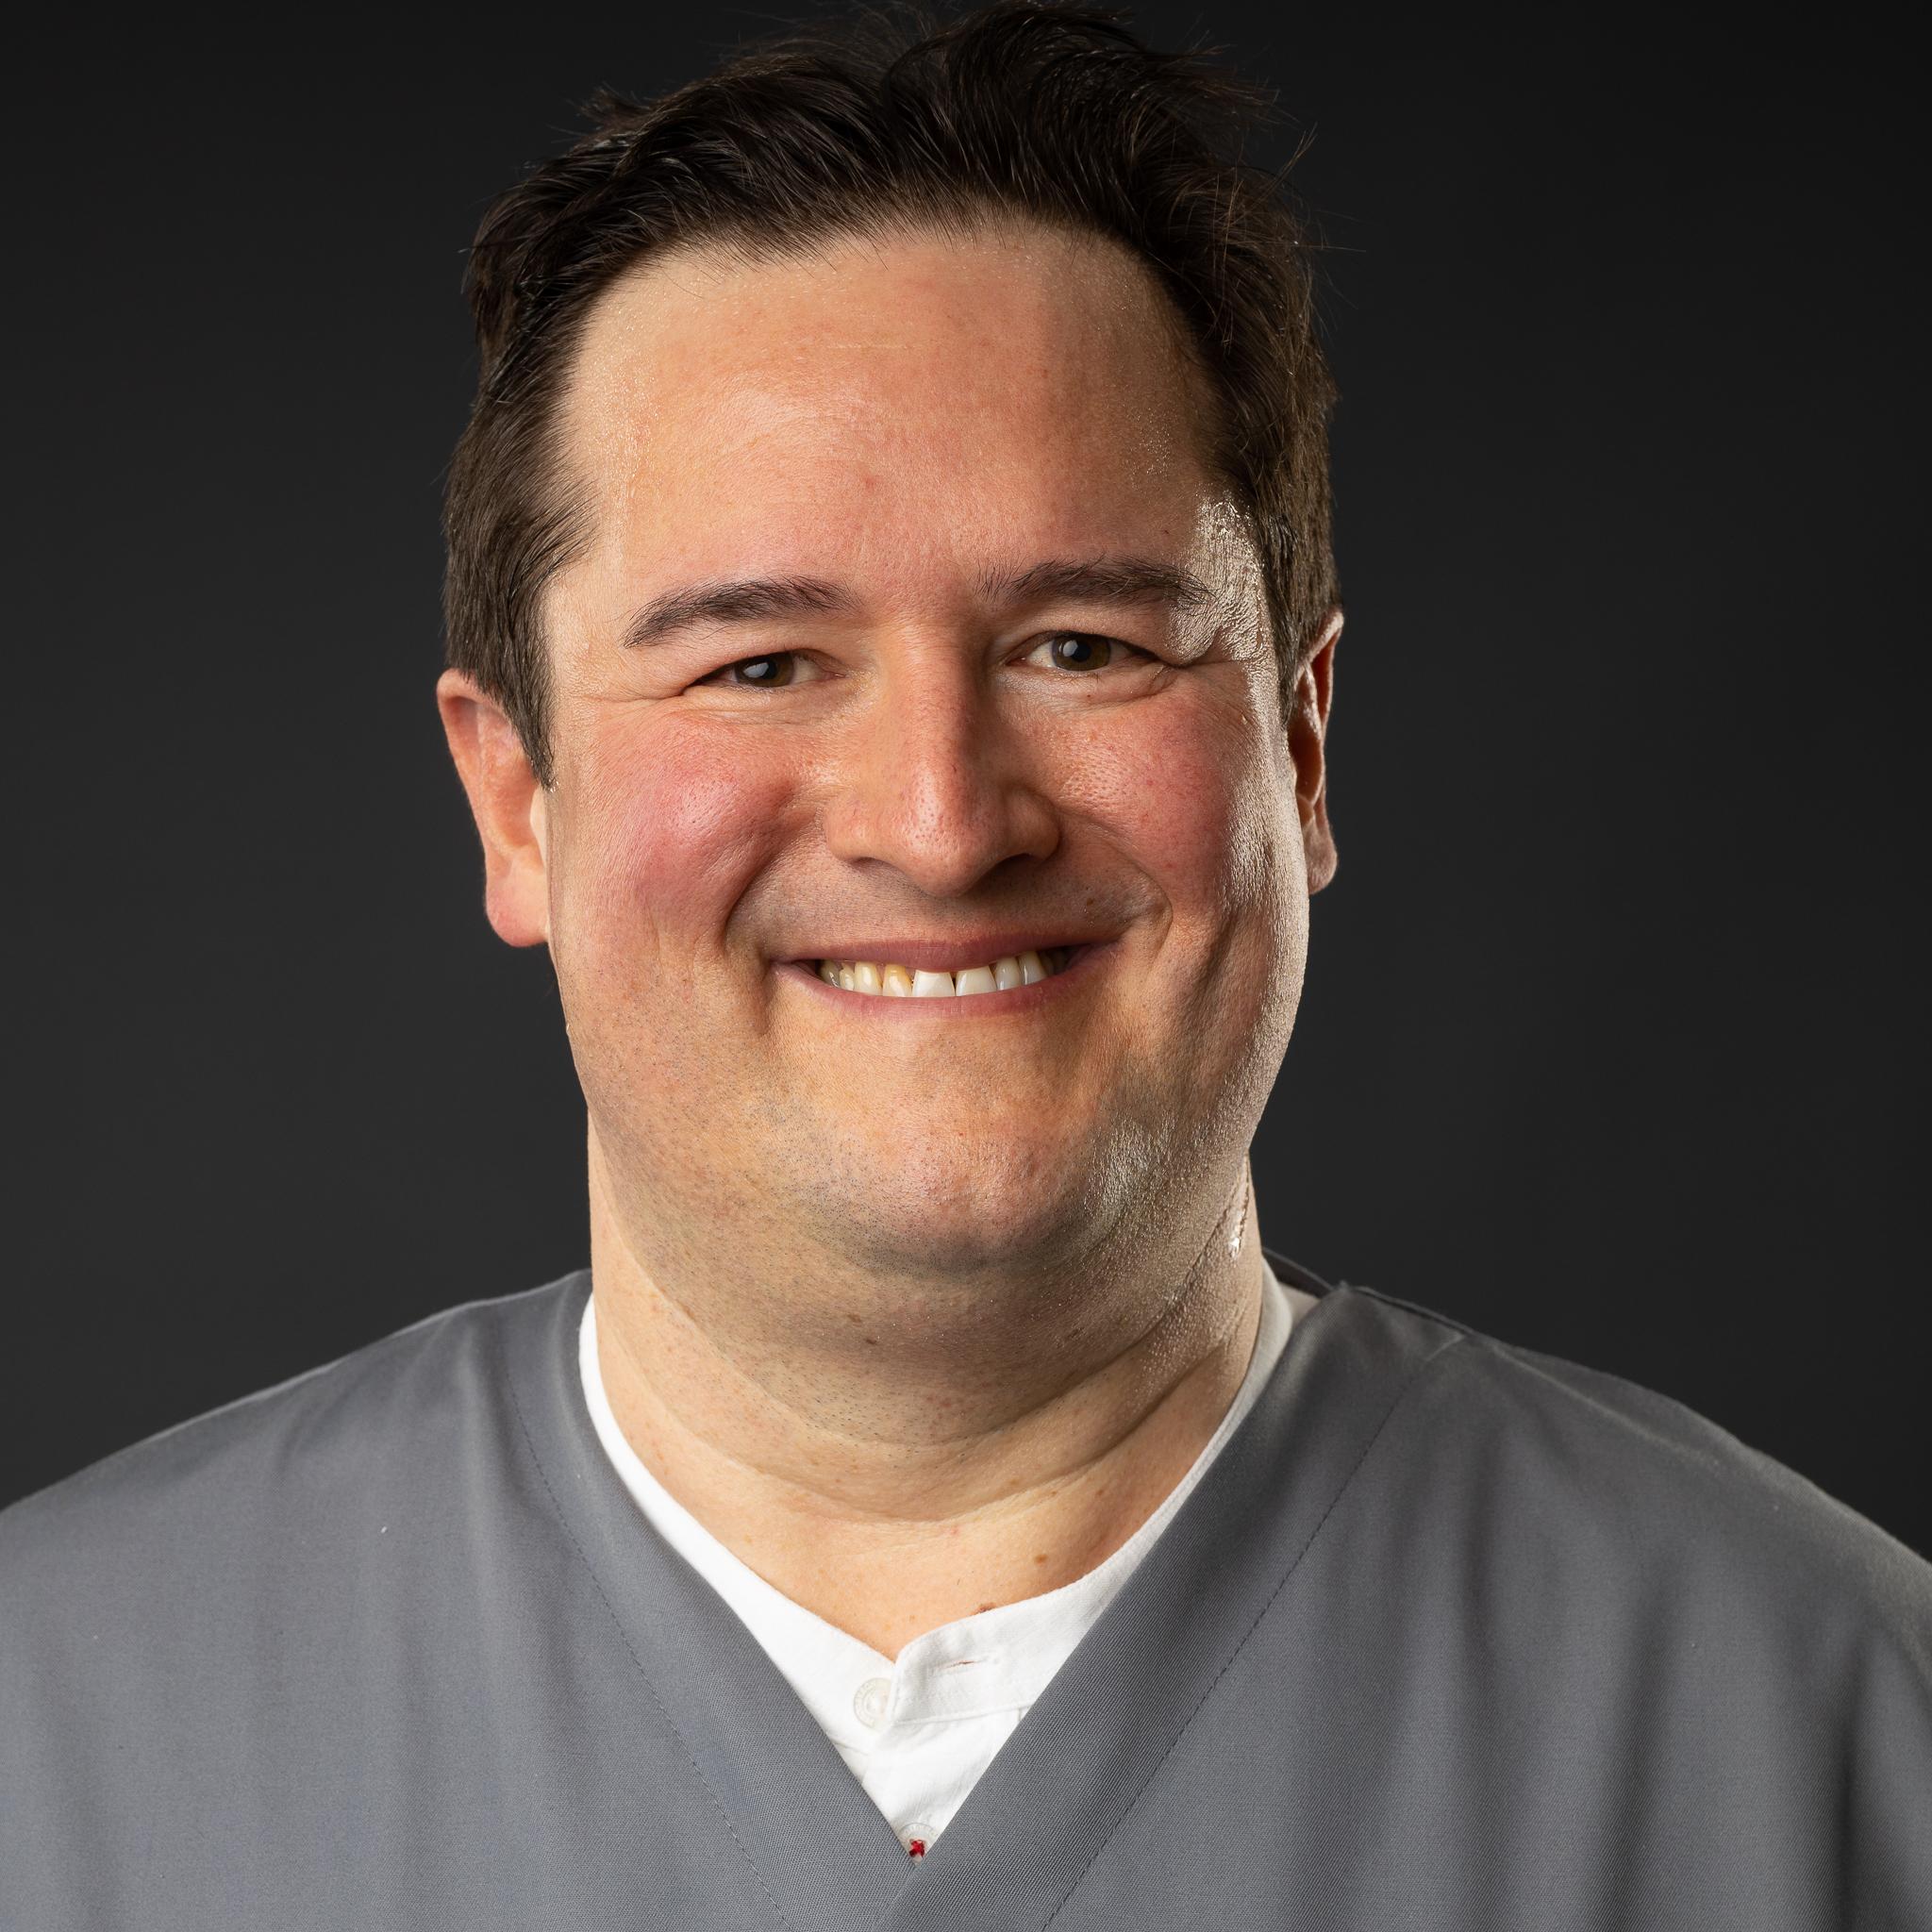 Dr. Thomas Regnet